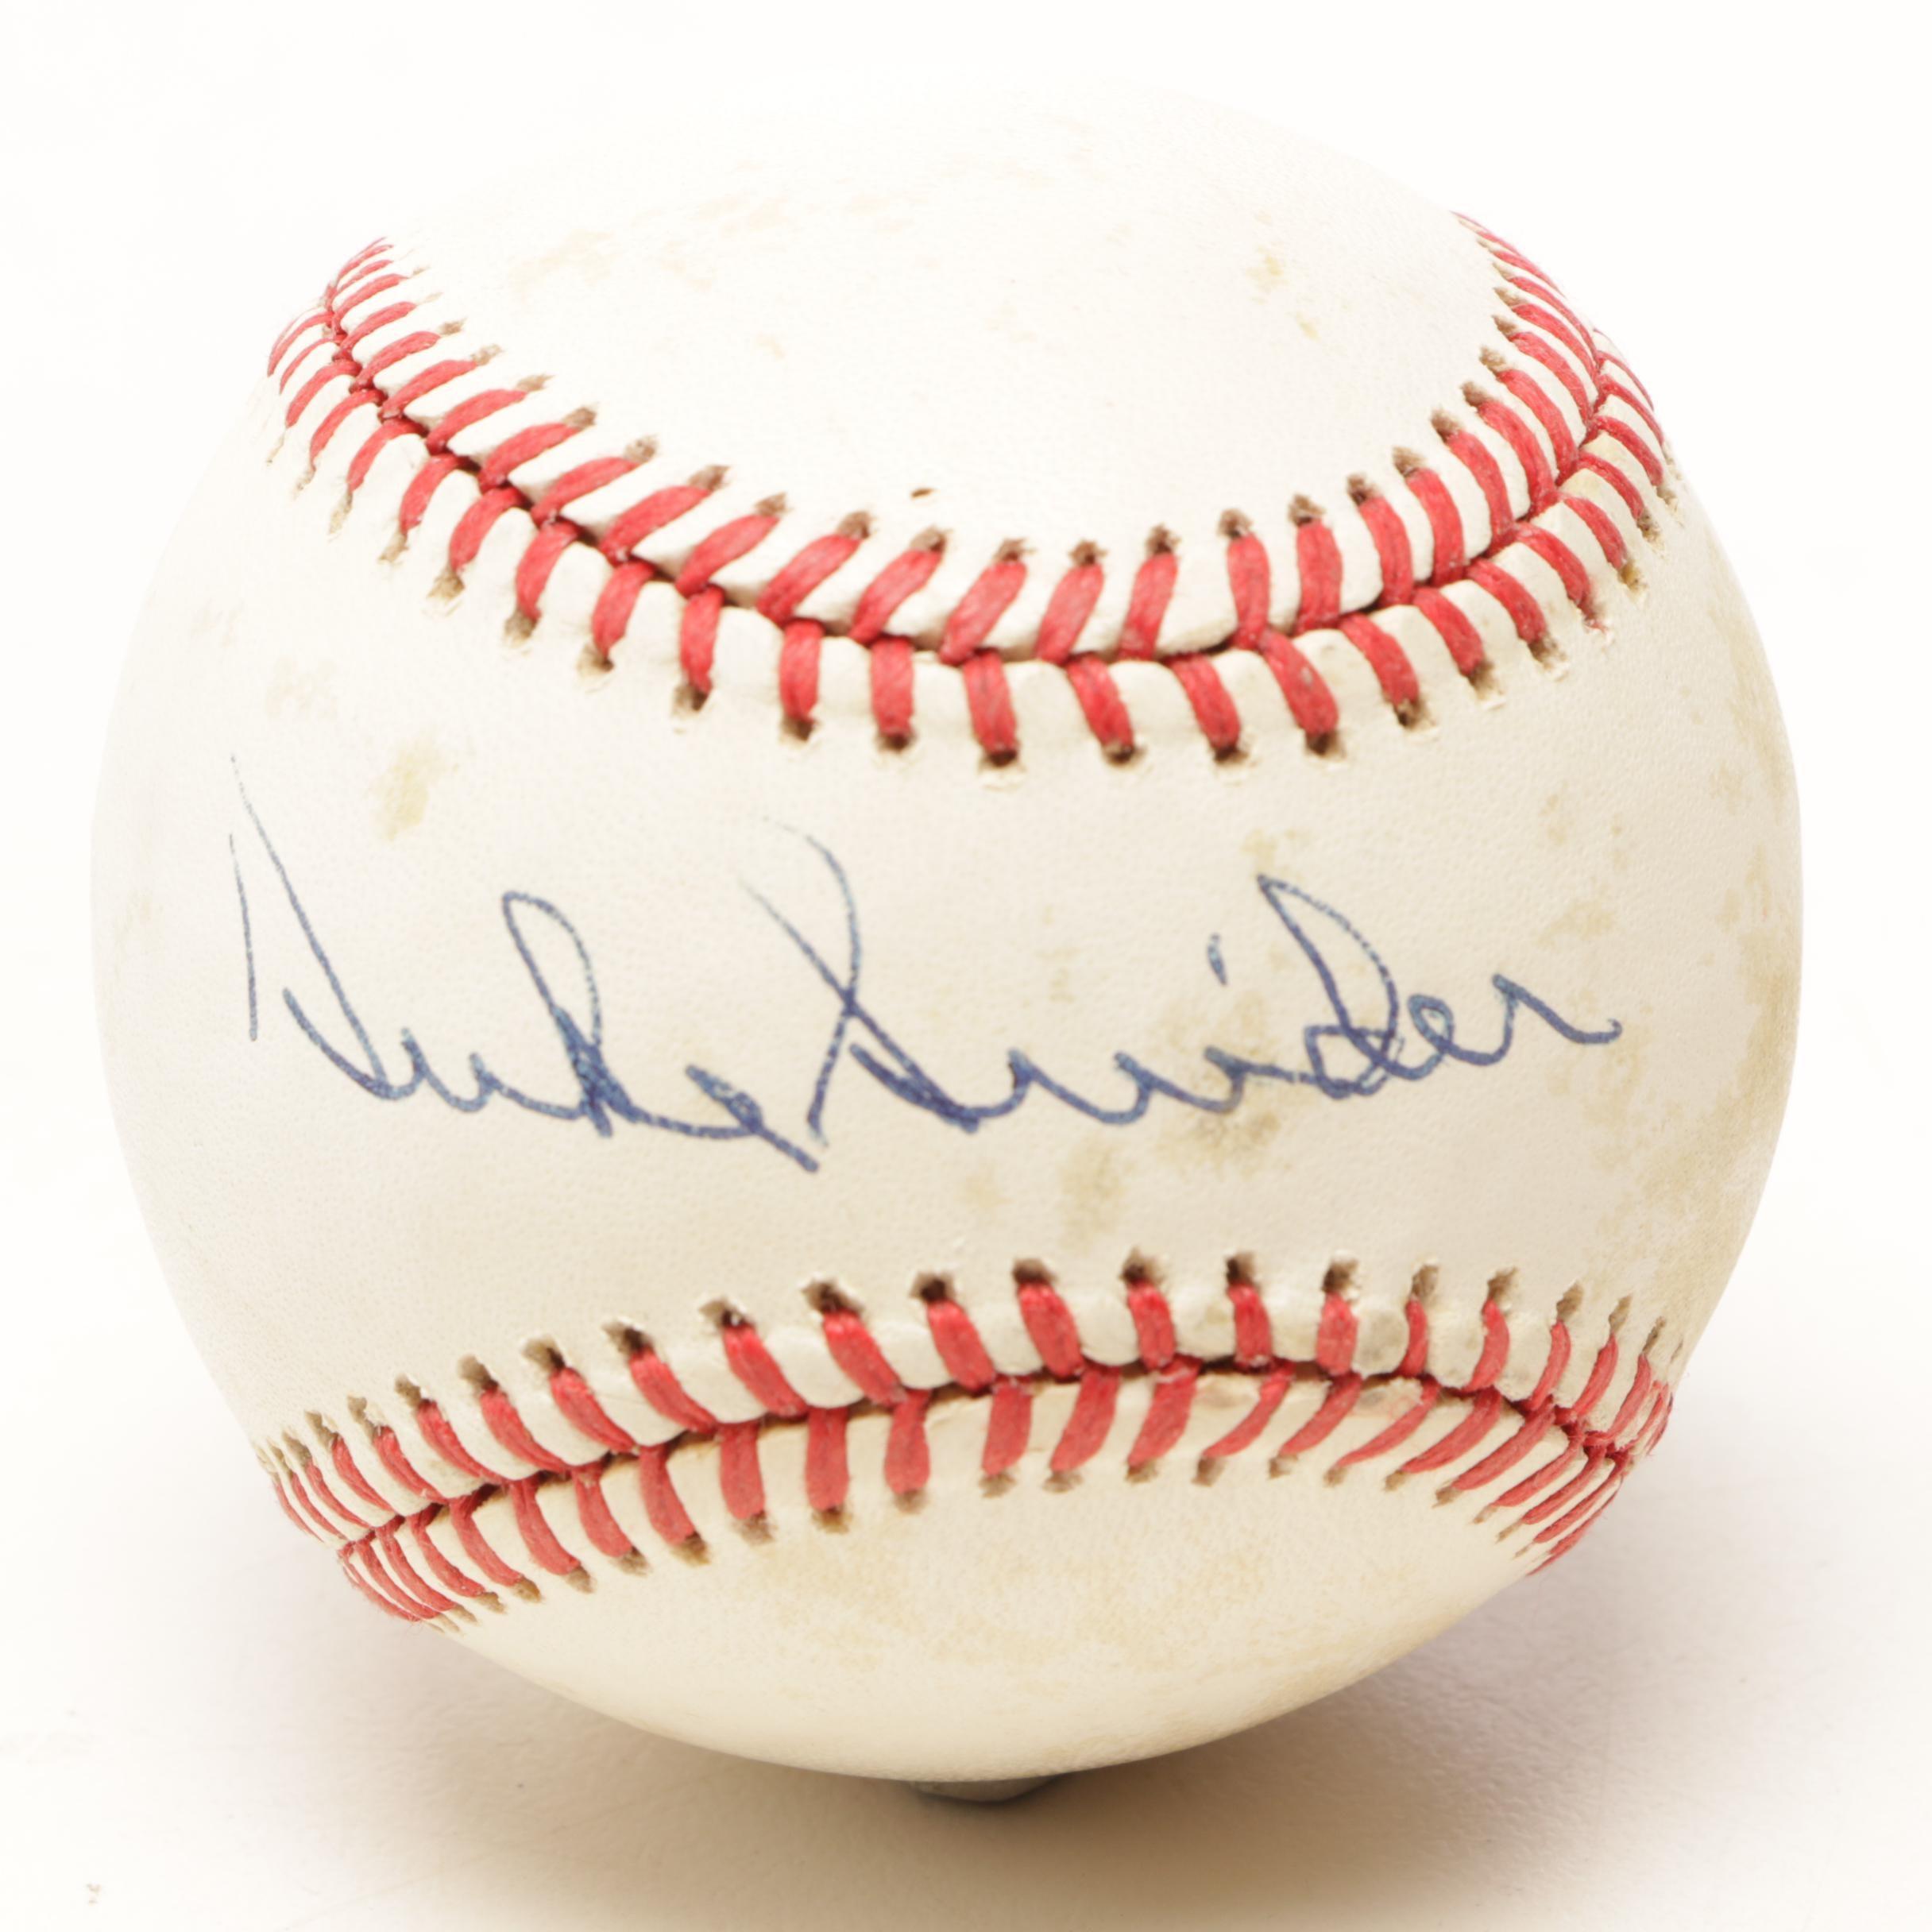 (HOF) Duke Snider Signed Rawlings National League Baseball